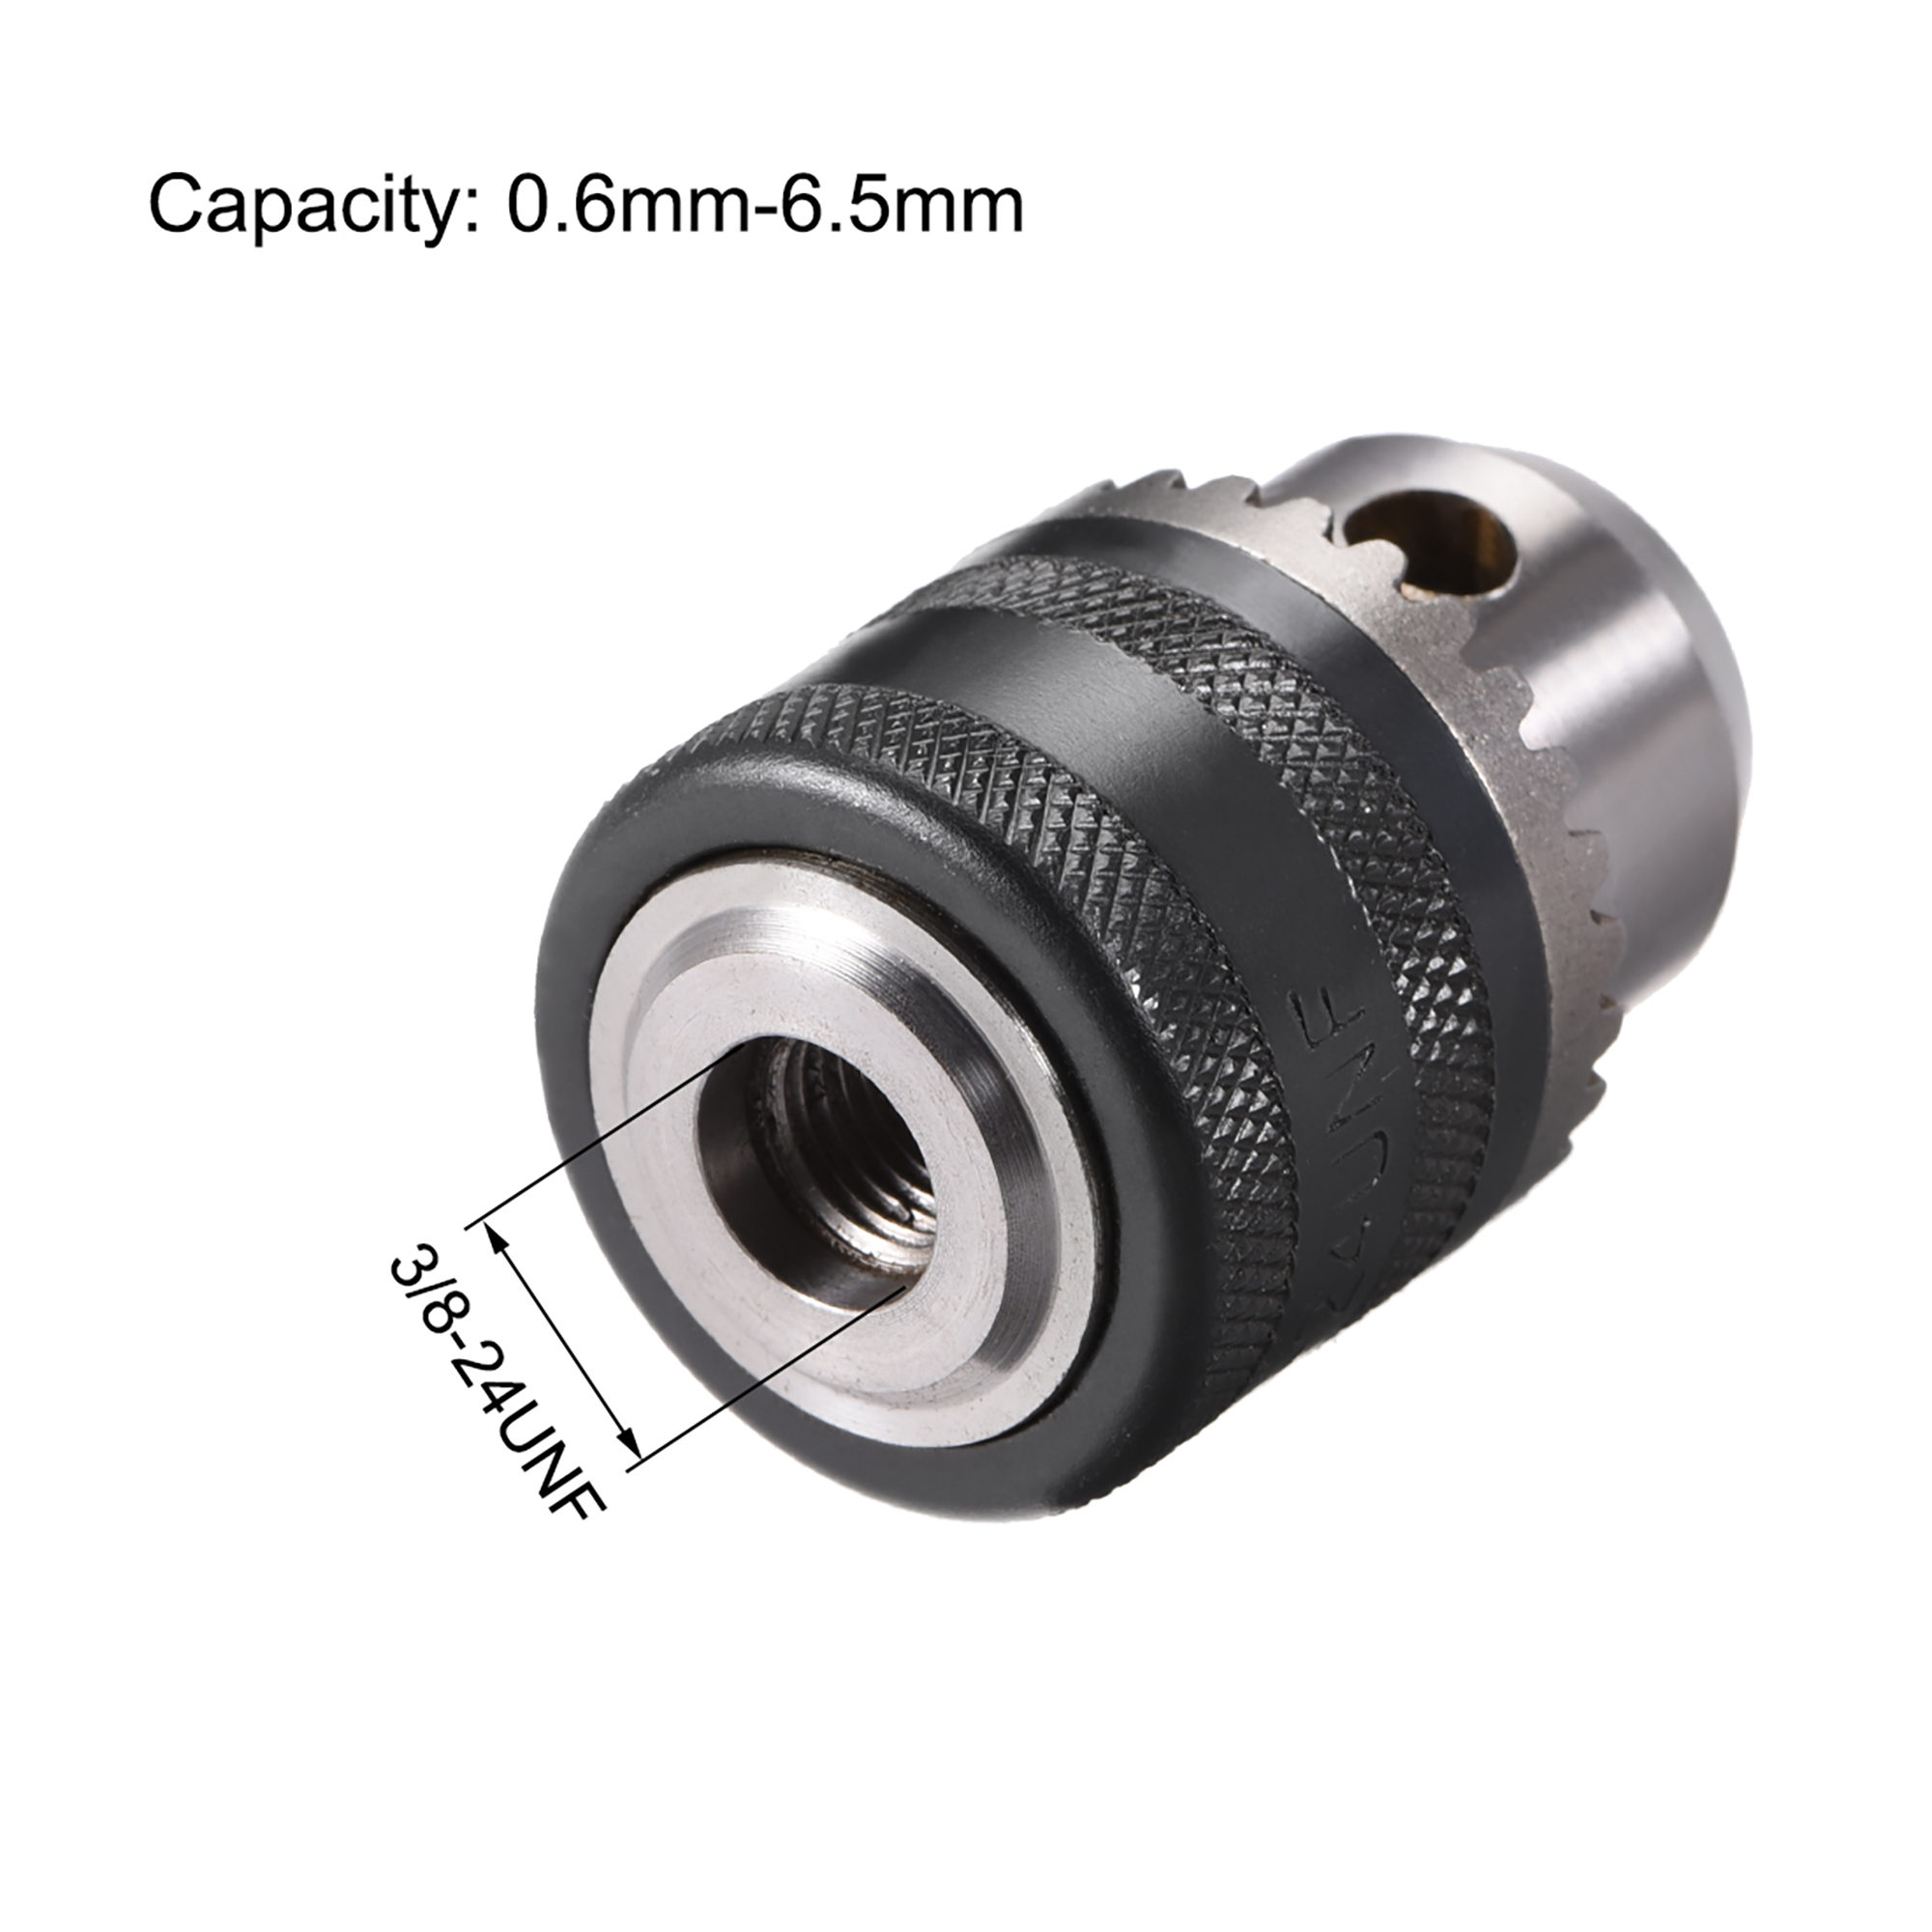 Keyed 3//8-24UNF Mount 0.6-6mm Spanner Drill Chuck Set